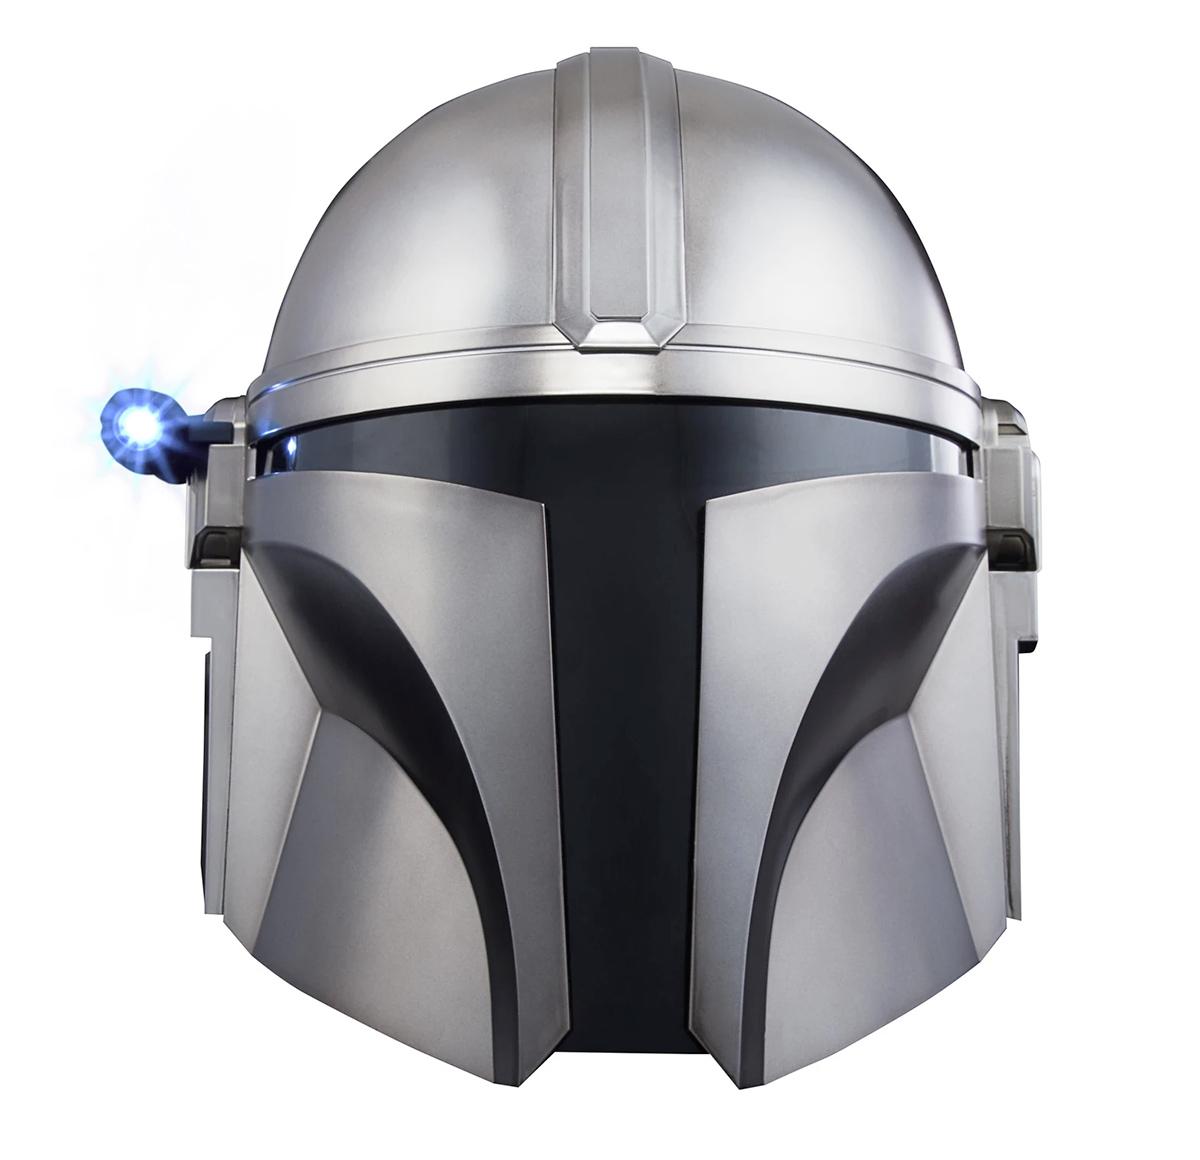 The Mandalorian Electronic Helmet Star Wars The Black Series